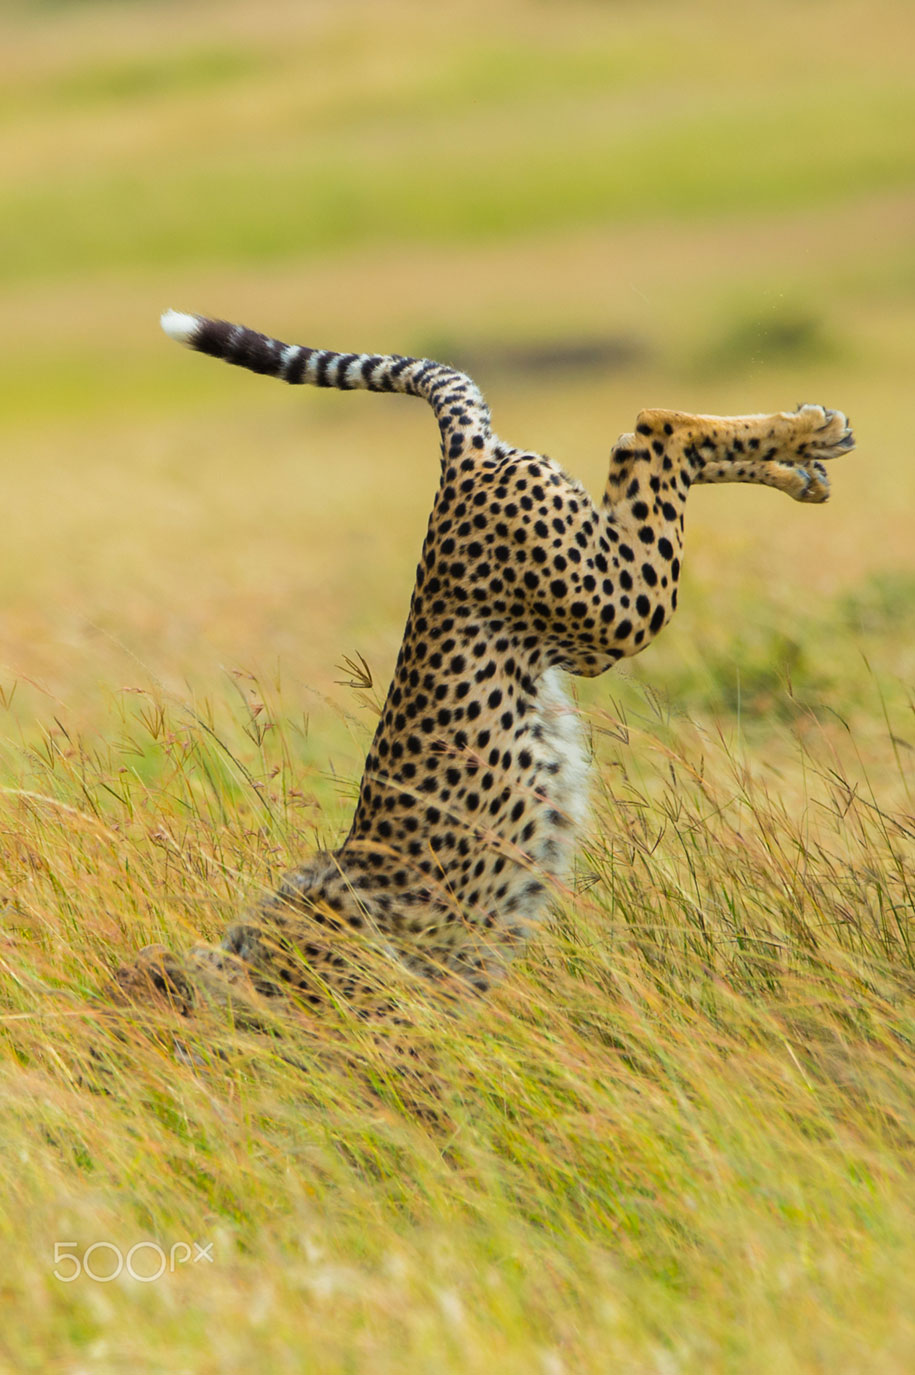 Comedy Wildlife Photography Awards 2015 (13)